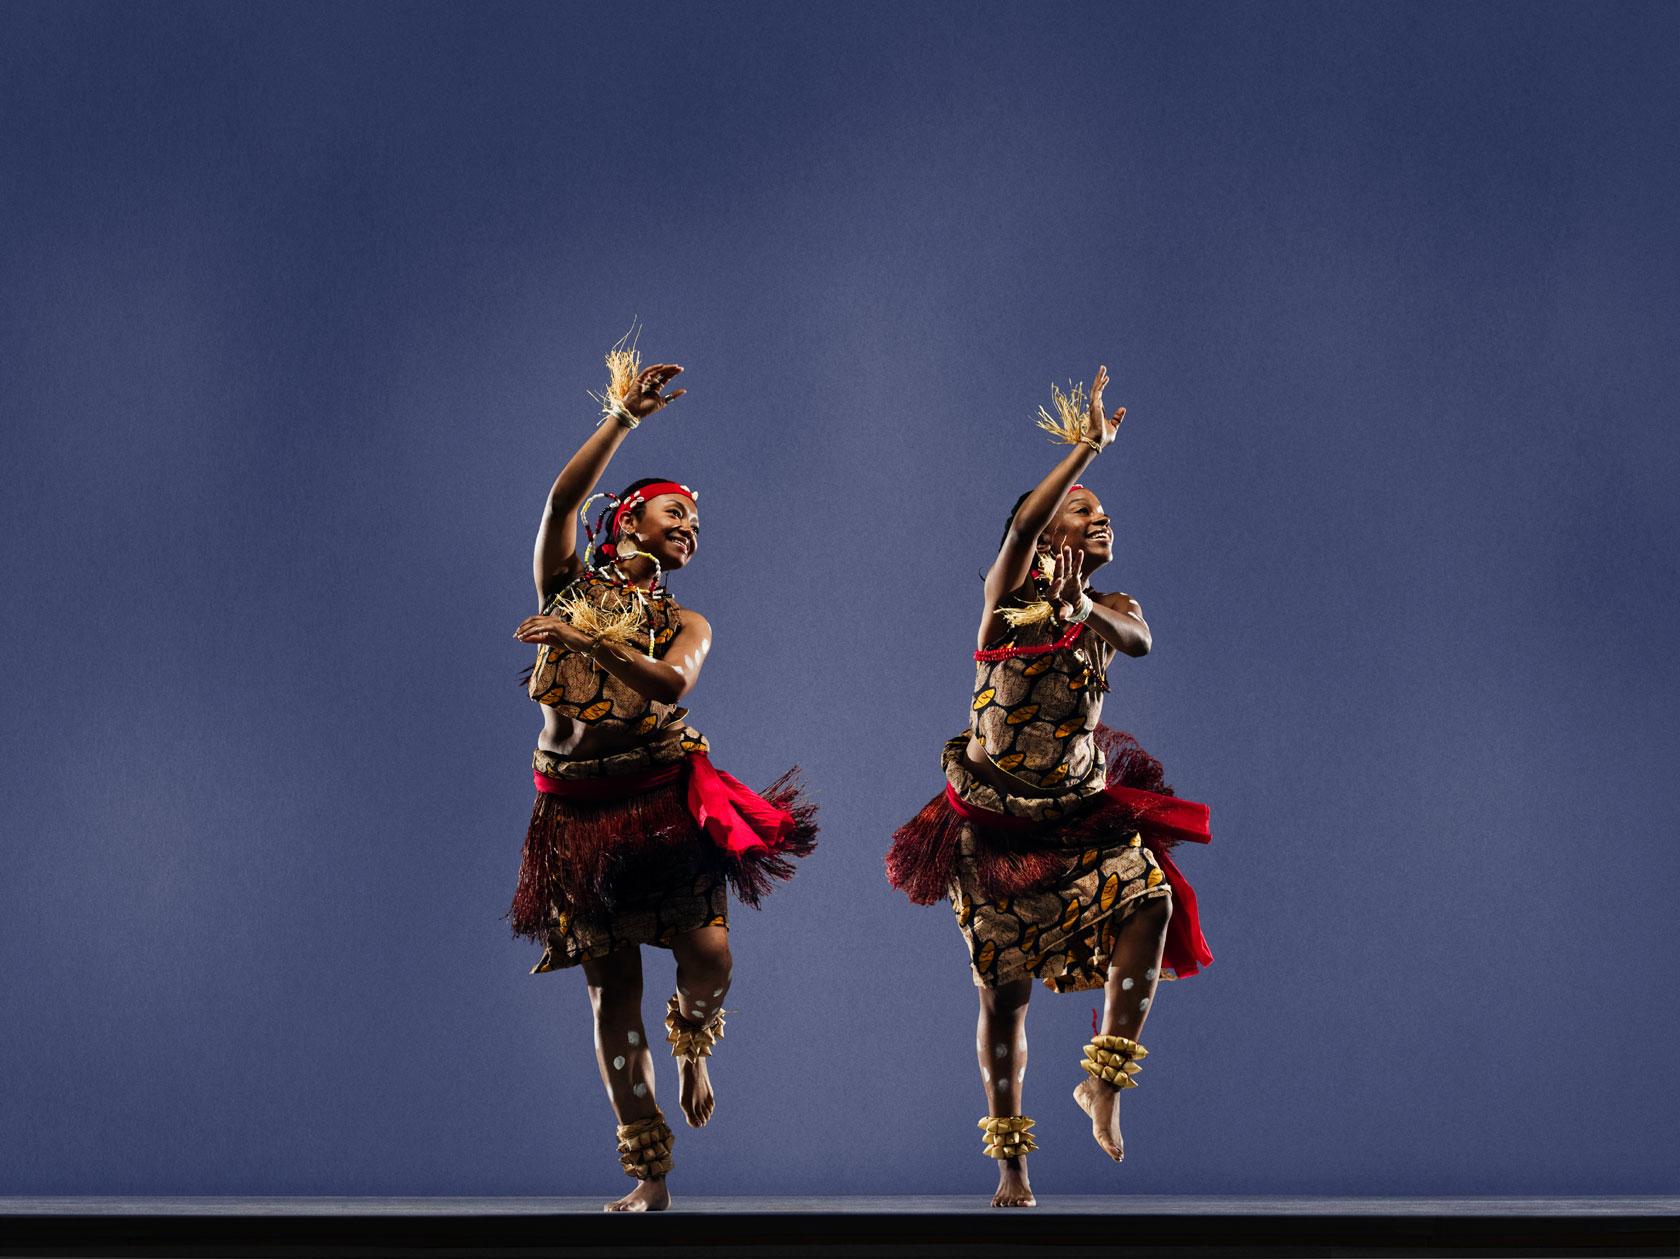 Photo: C Fua DIa Congo via World Arts West